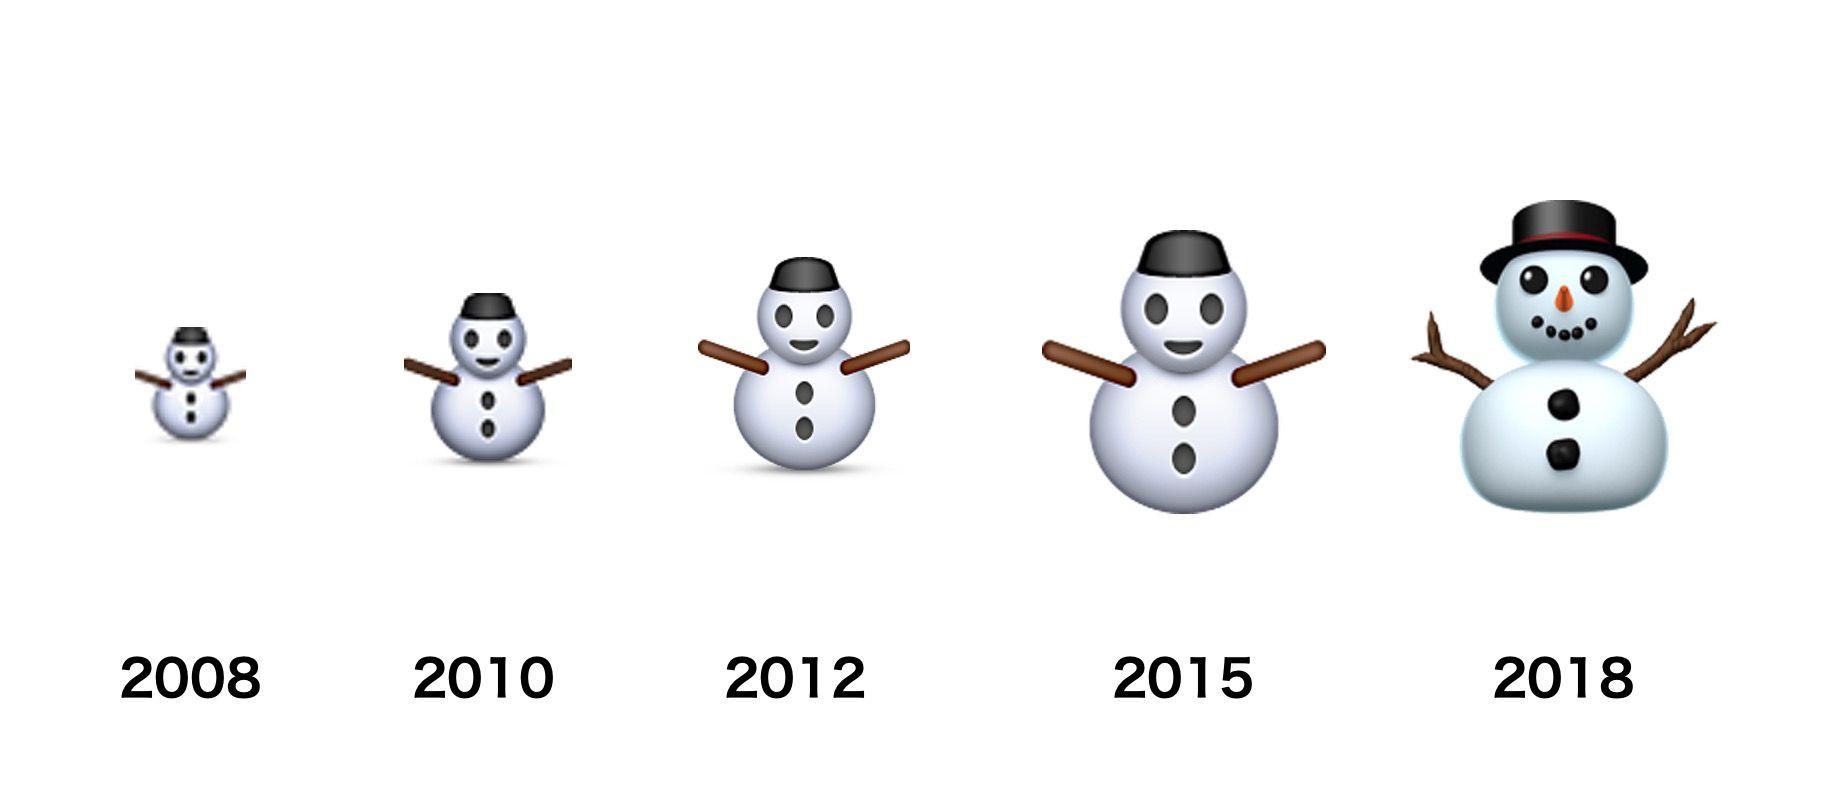 Christmas Emojis: The Comprehensive Guide